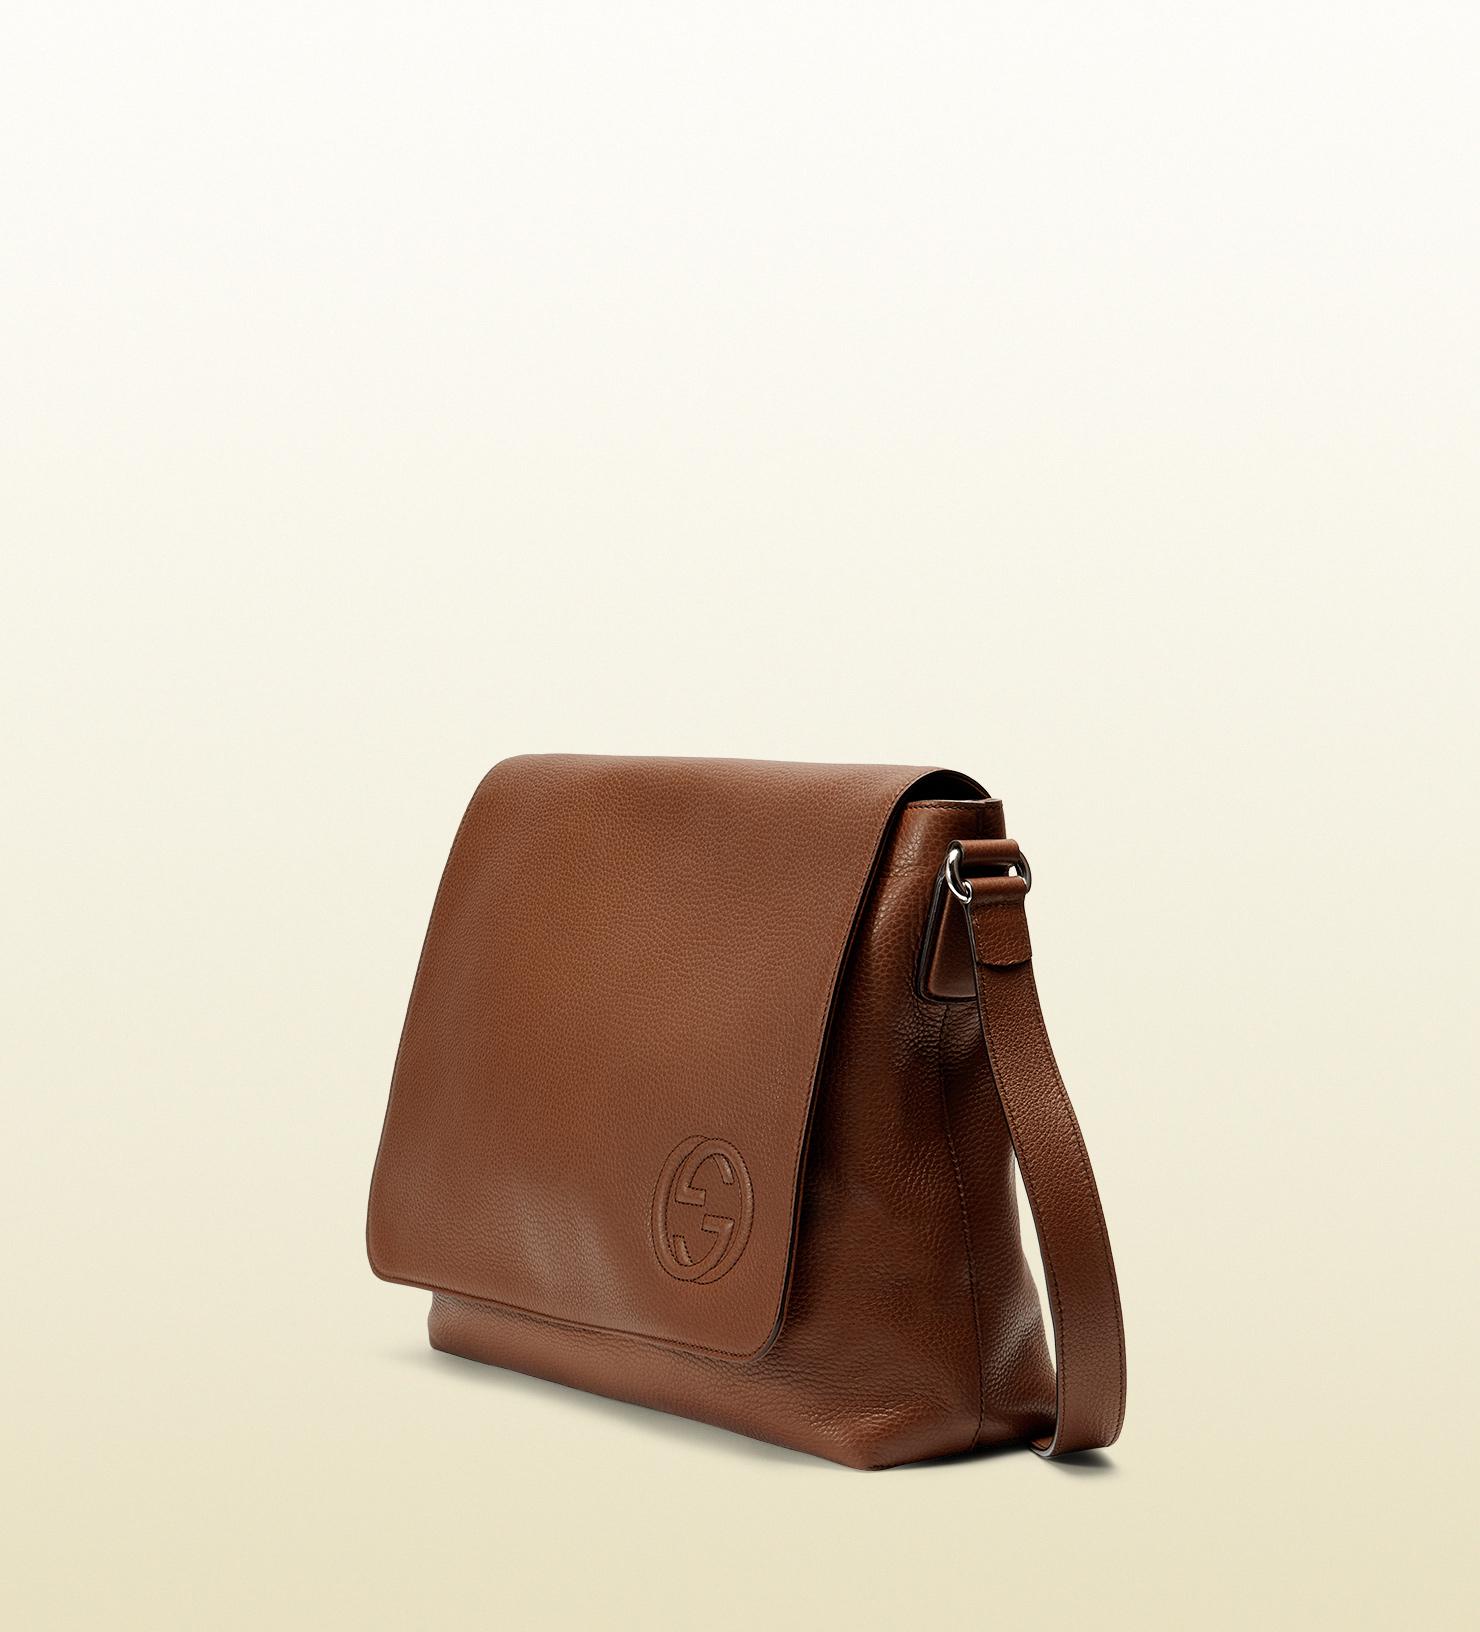 a608ee2201e7a Vine Gucci Bag Brown Leather 1960s Jackie O Bouvier Purse